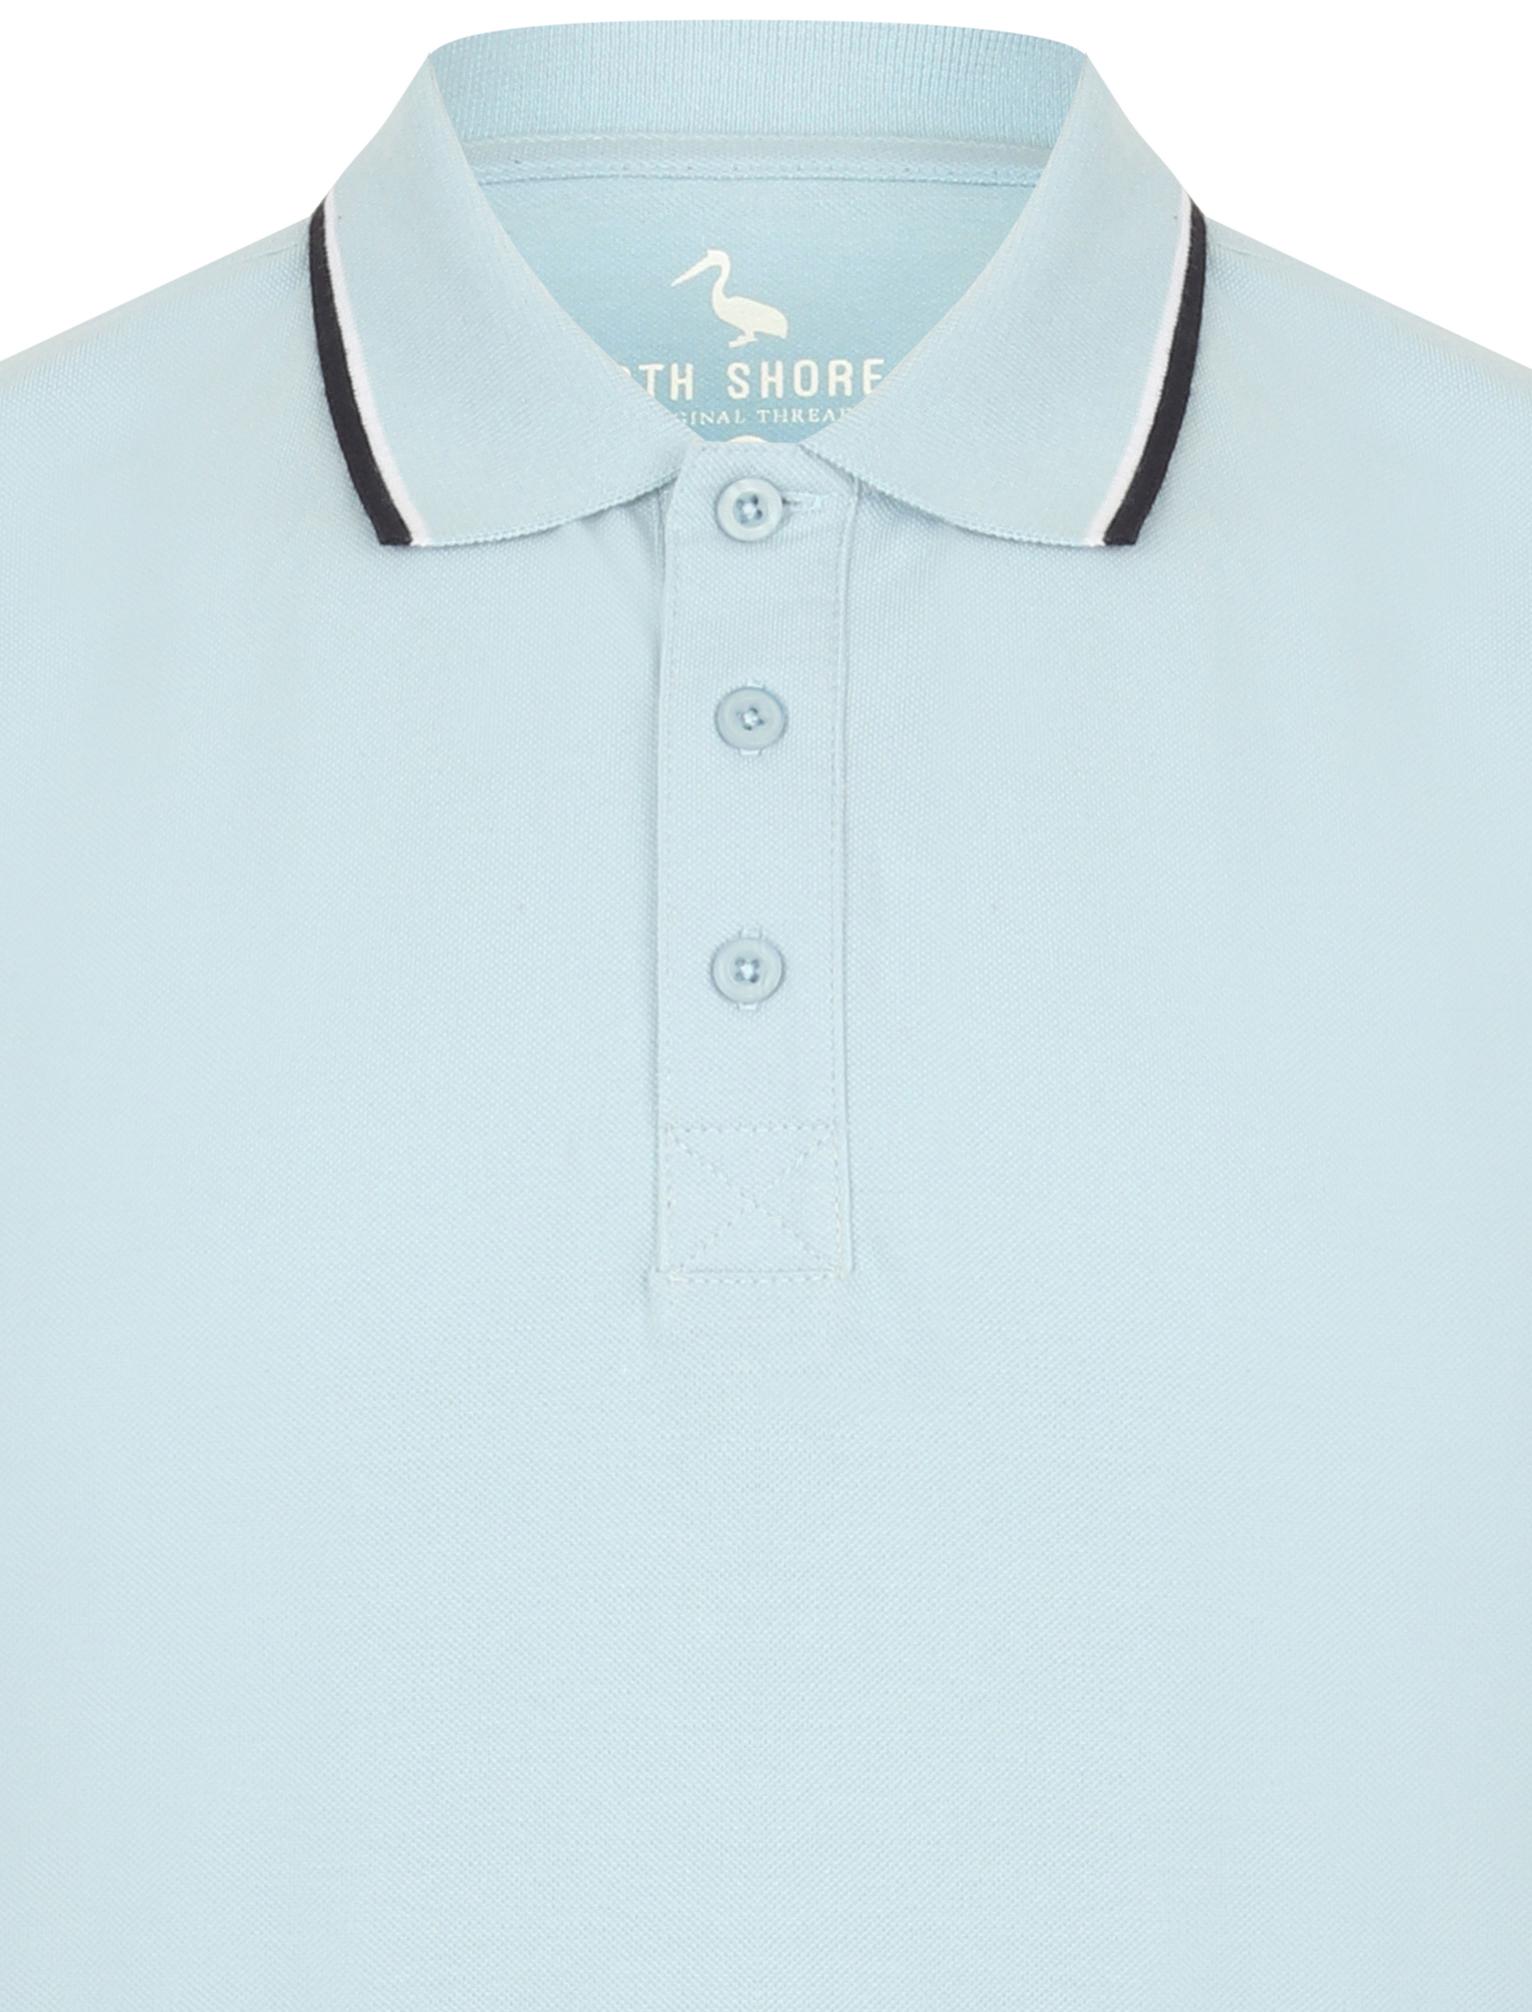 Sth-Shore-Mens-Plain-Polo-Shirt-100-Pique-Cotton-T-Shirt-Top-Collar-Size-M-XXL thumbnail 28